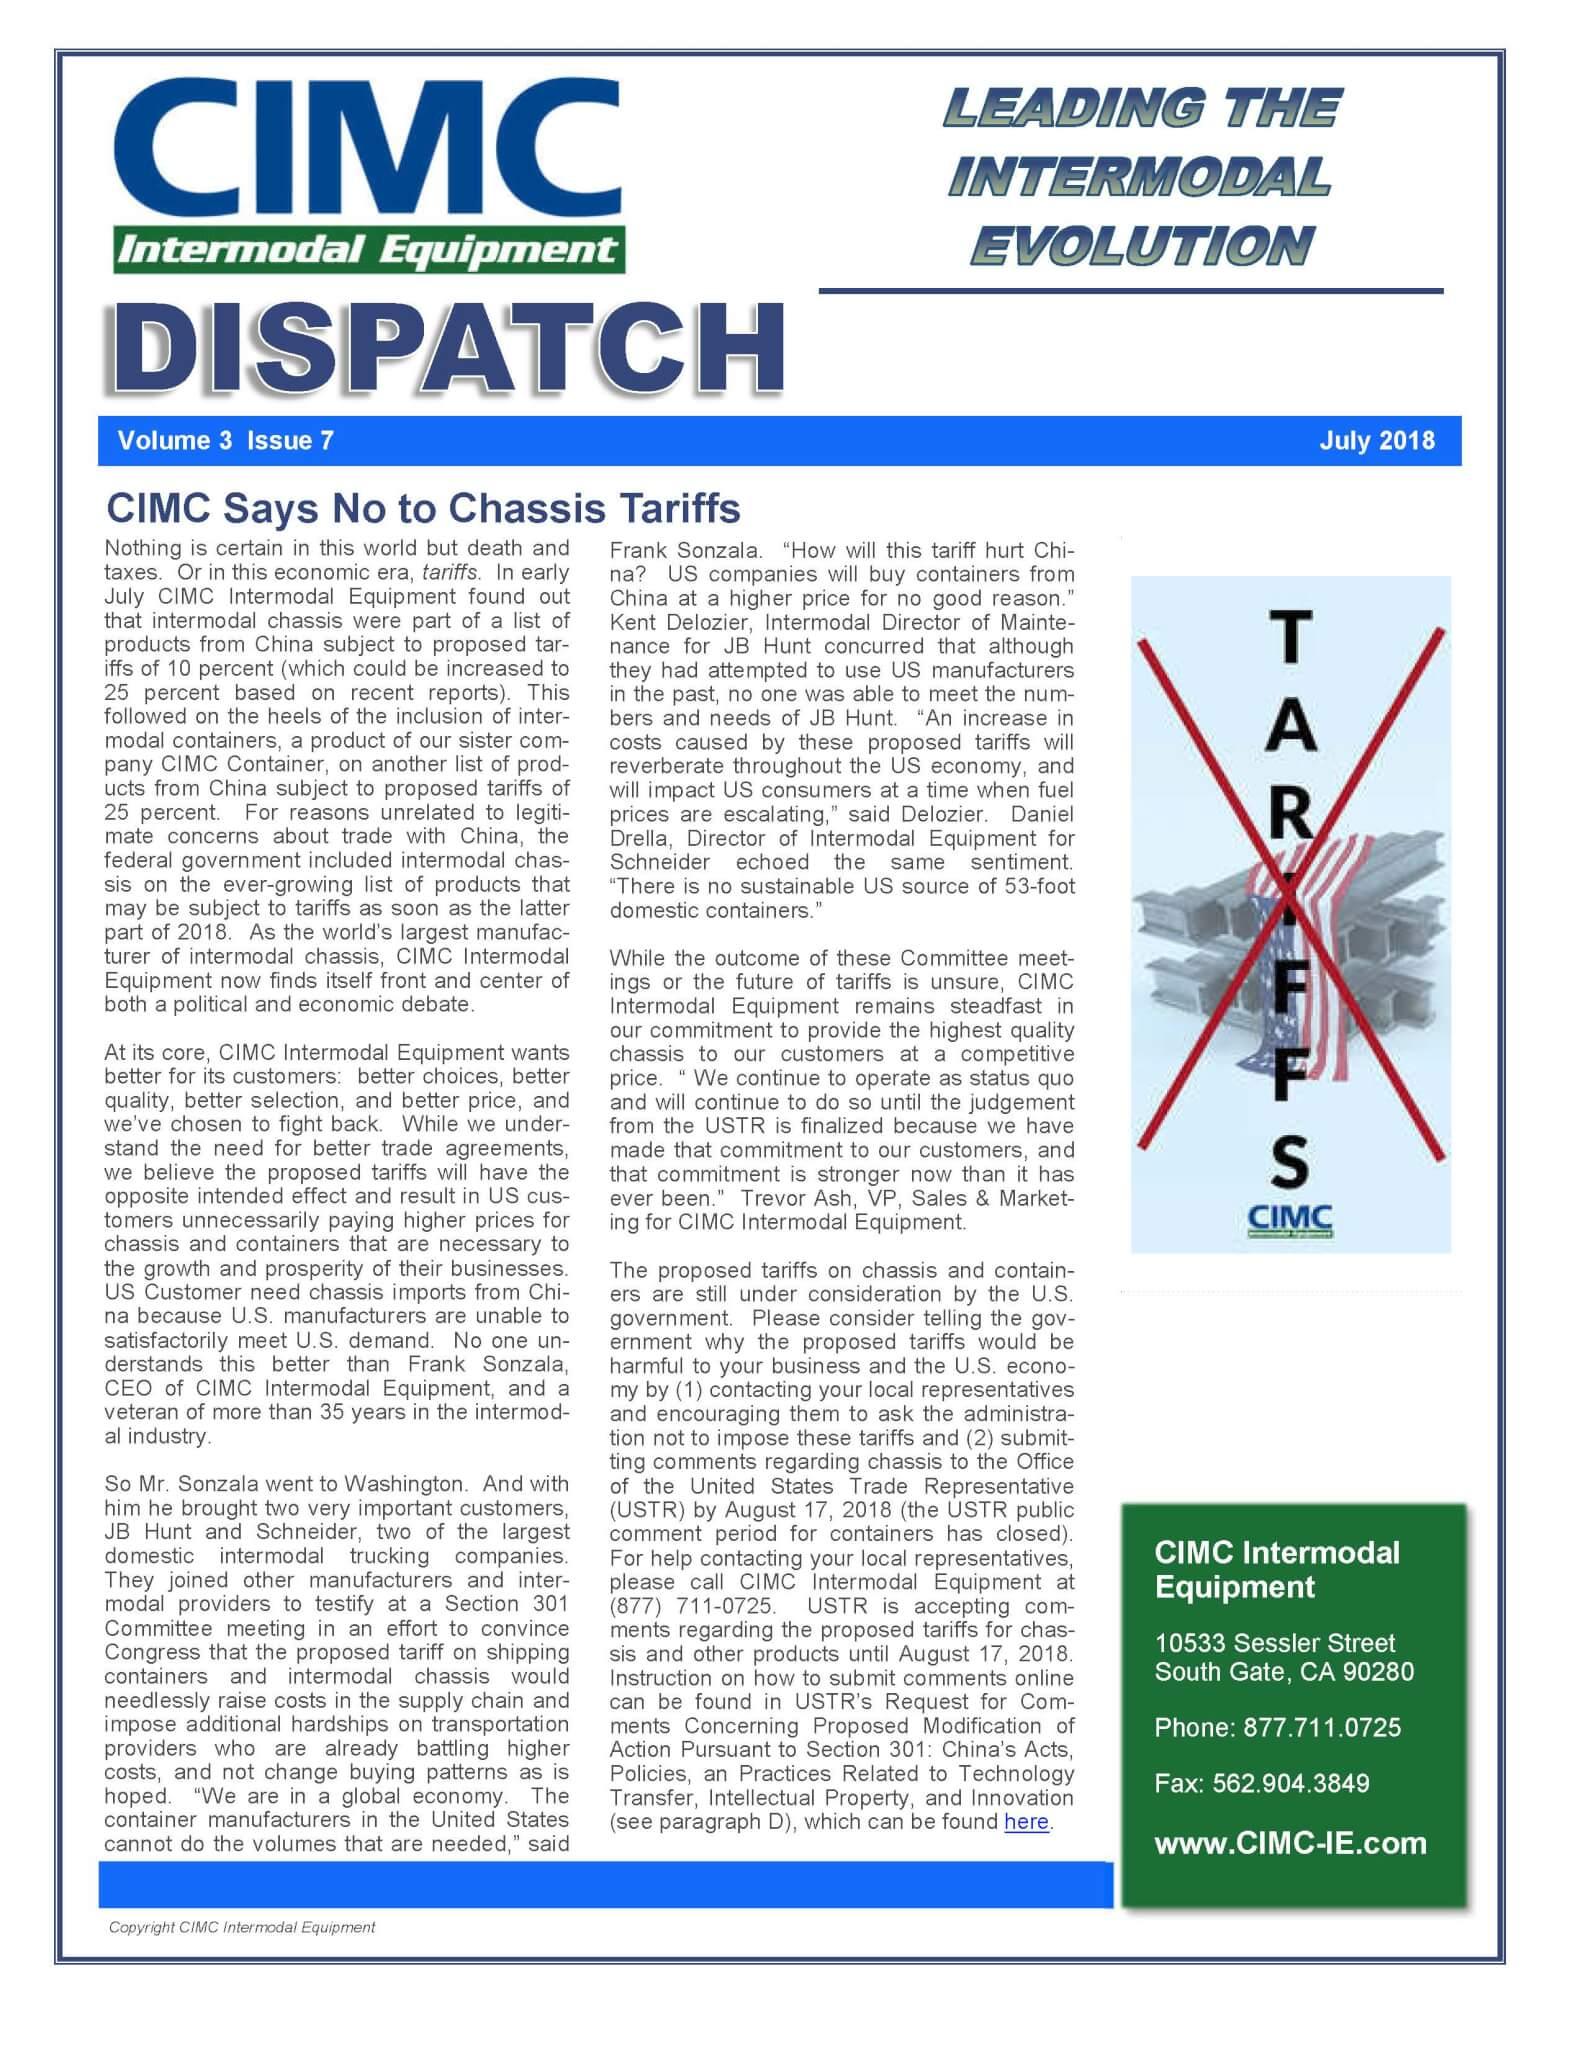 CIMC Dispatch July 2018